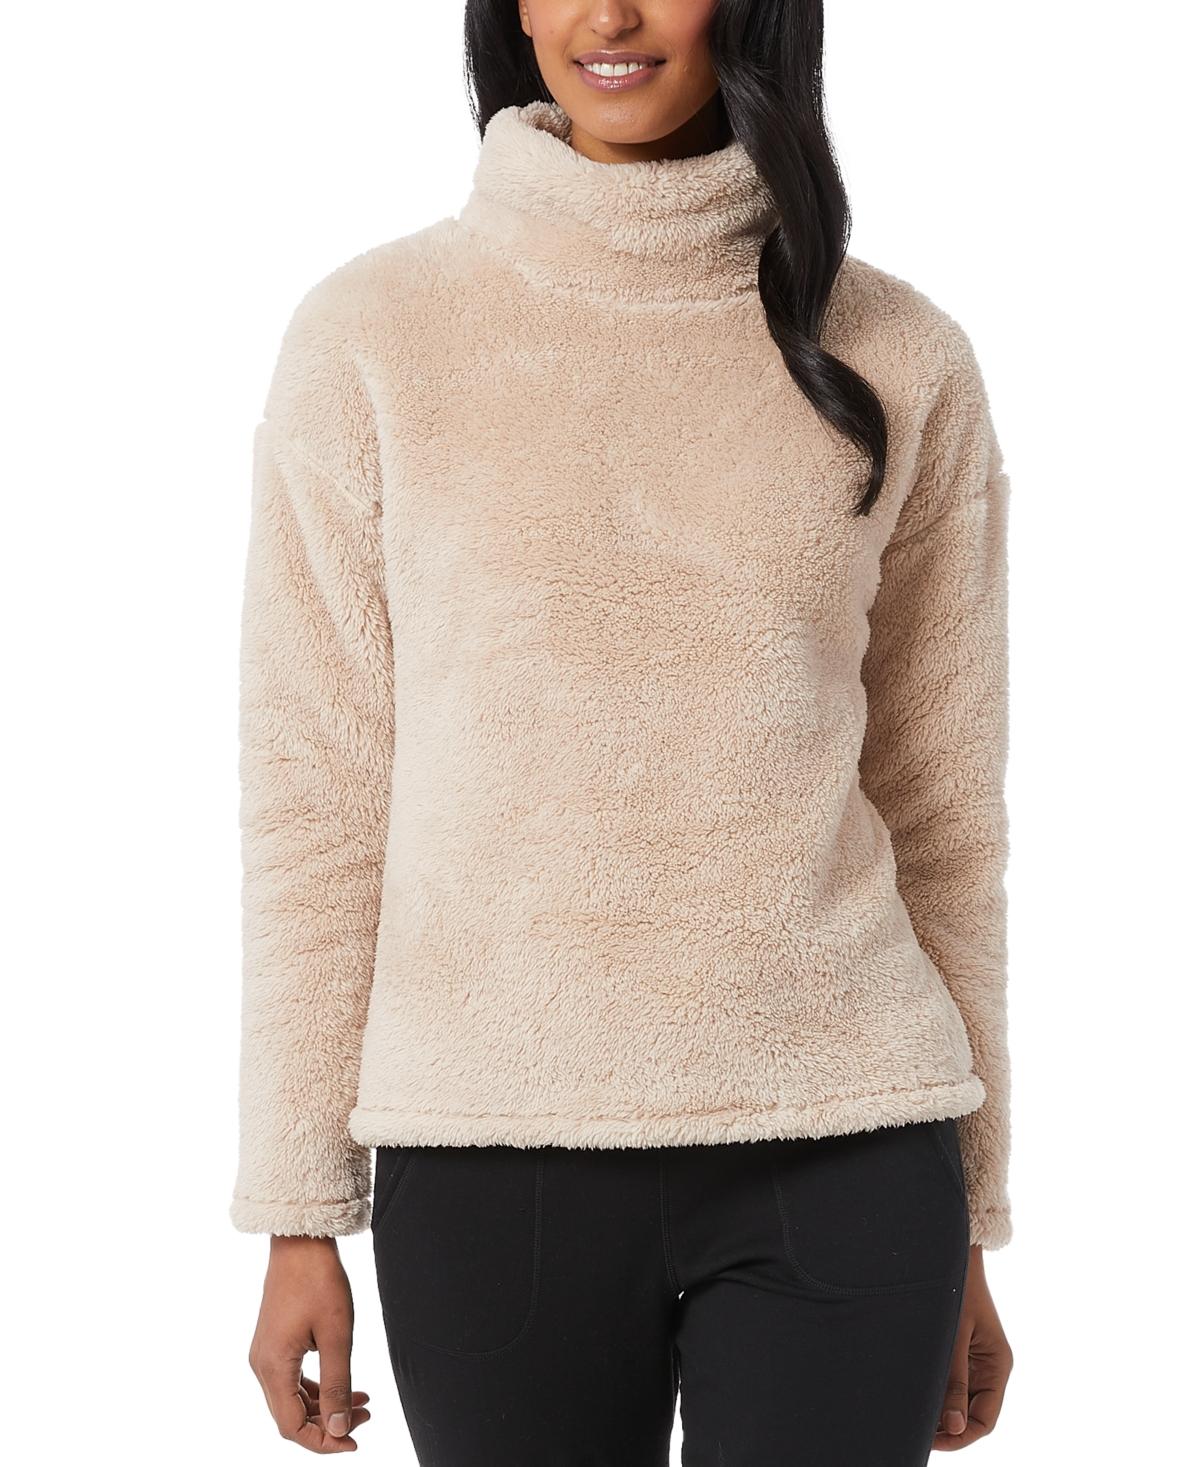 32 Degrees Sherpa Mock-Neck Sweater